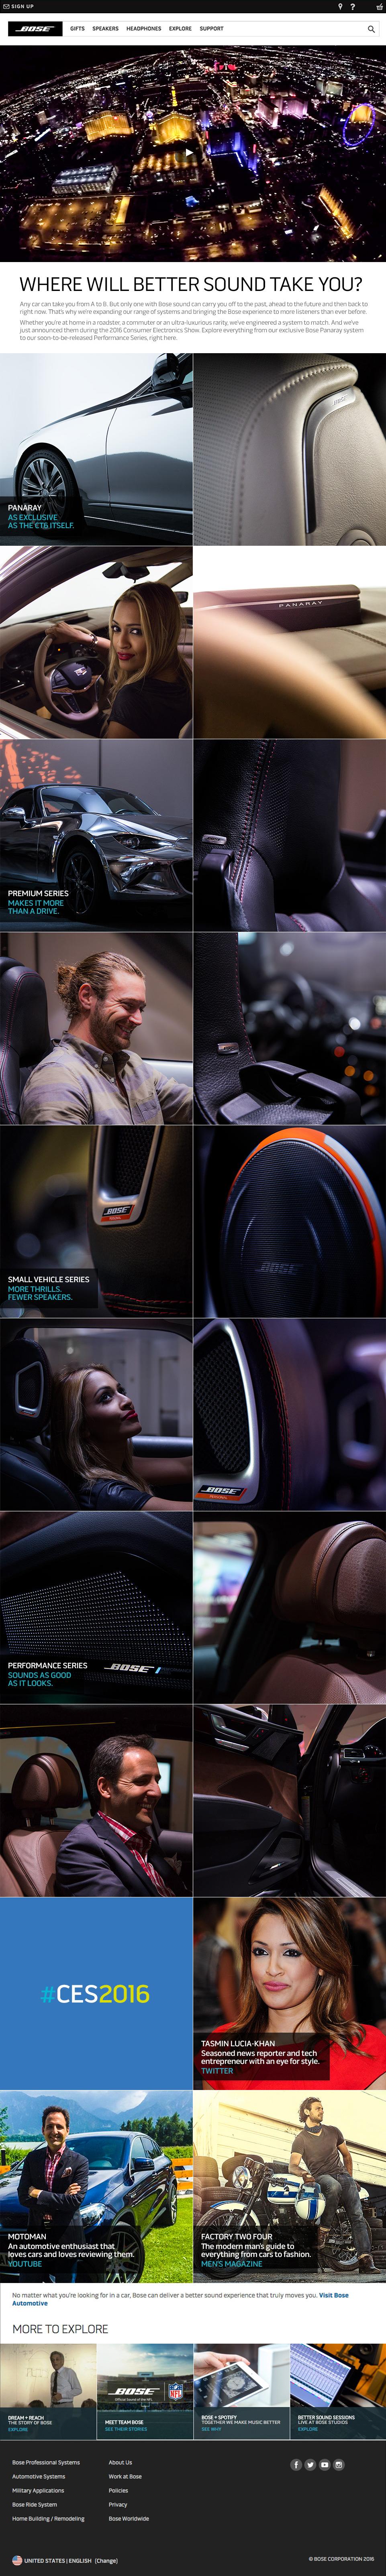 Bose Auto Experience landing page